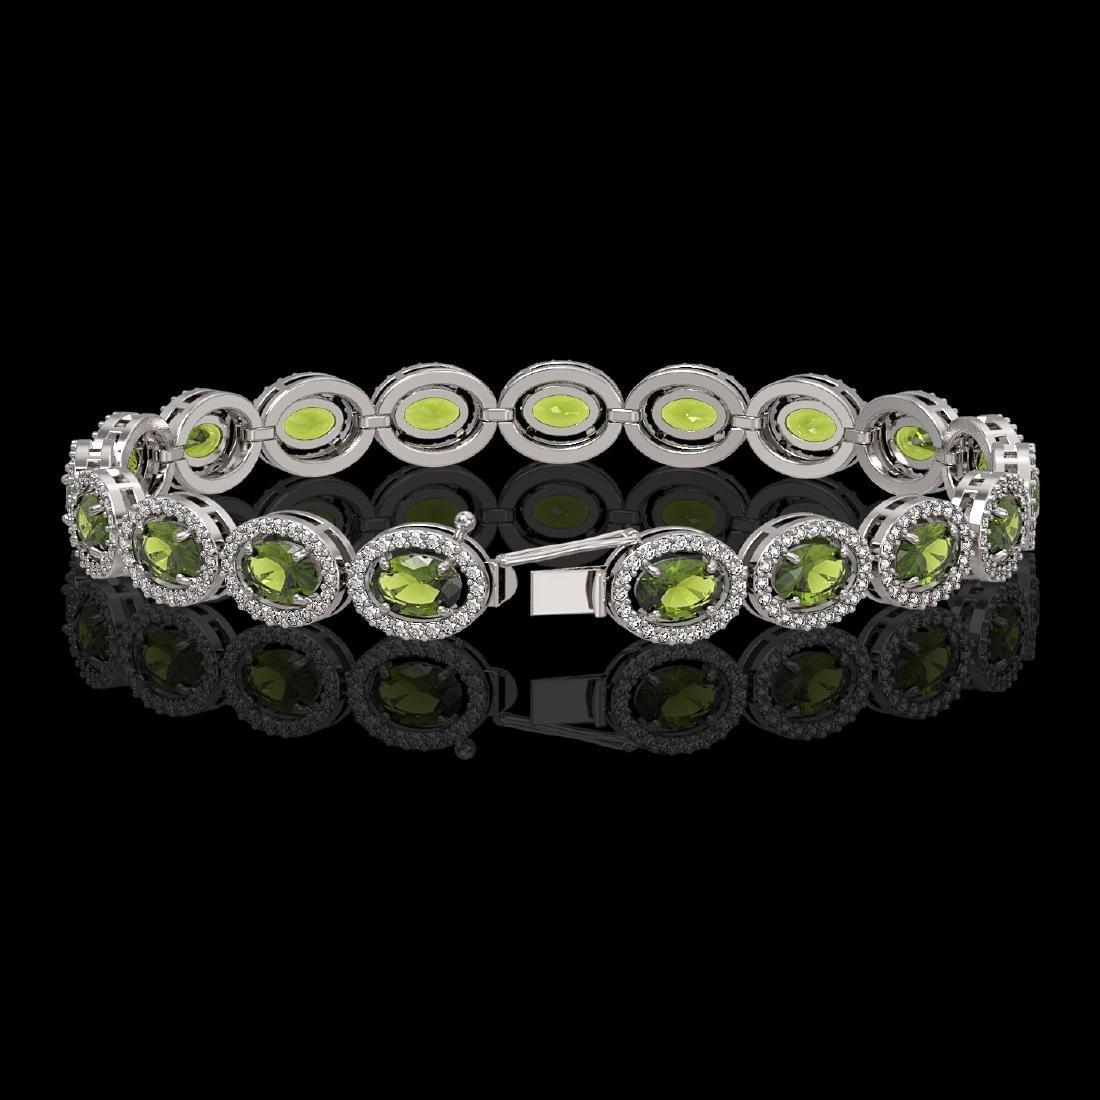 13.87 CTW Tourmaline & Diamond Halo Bracelet 10K White - 2